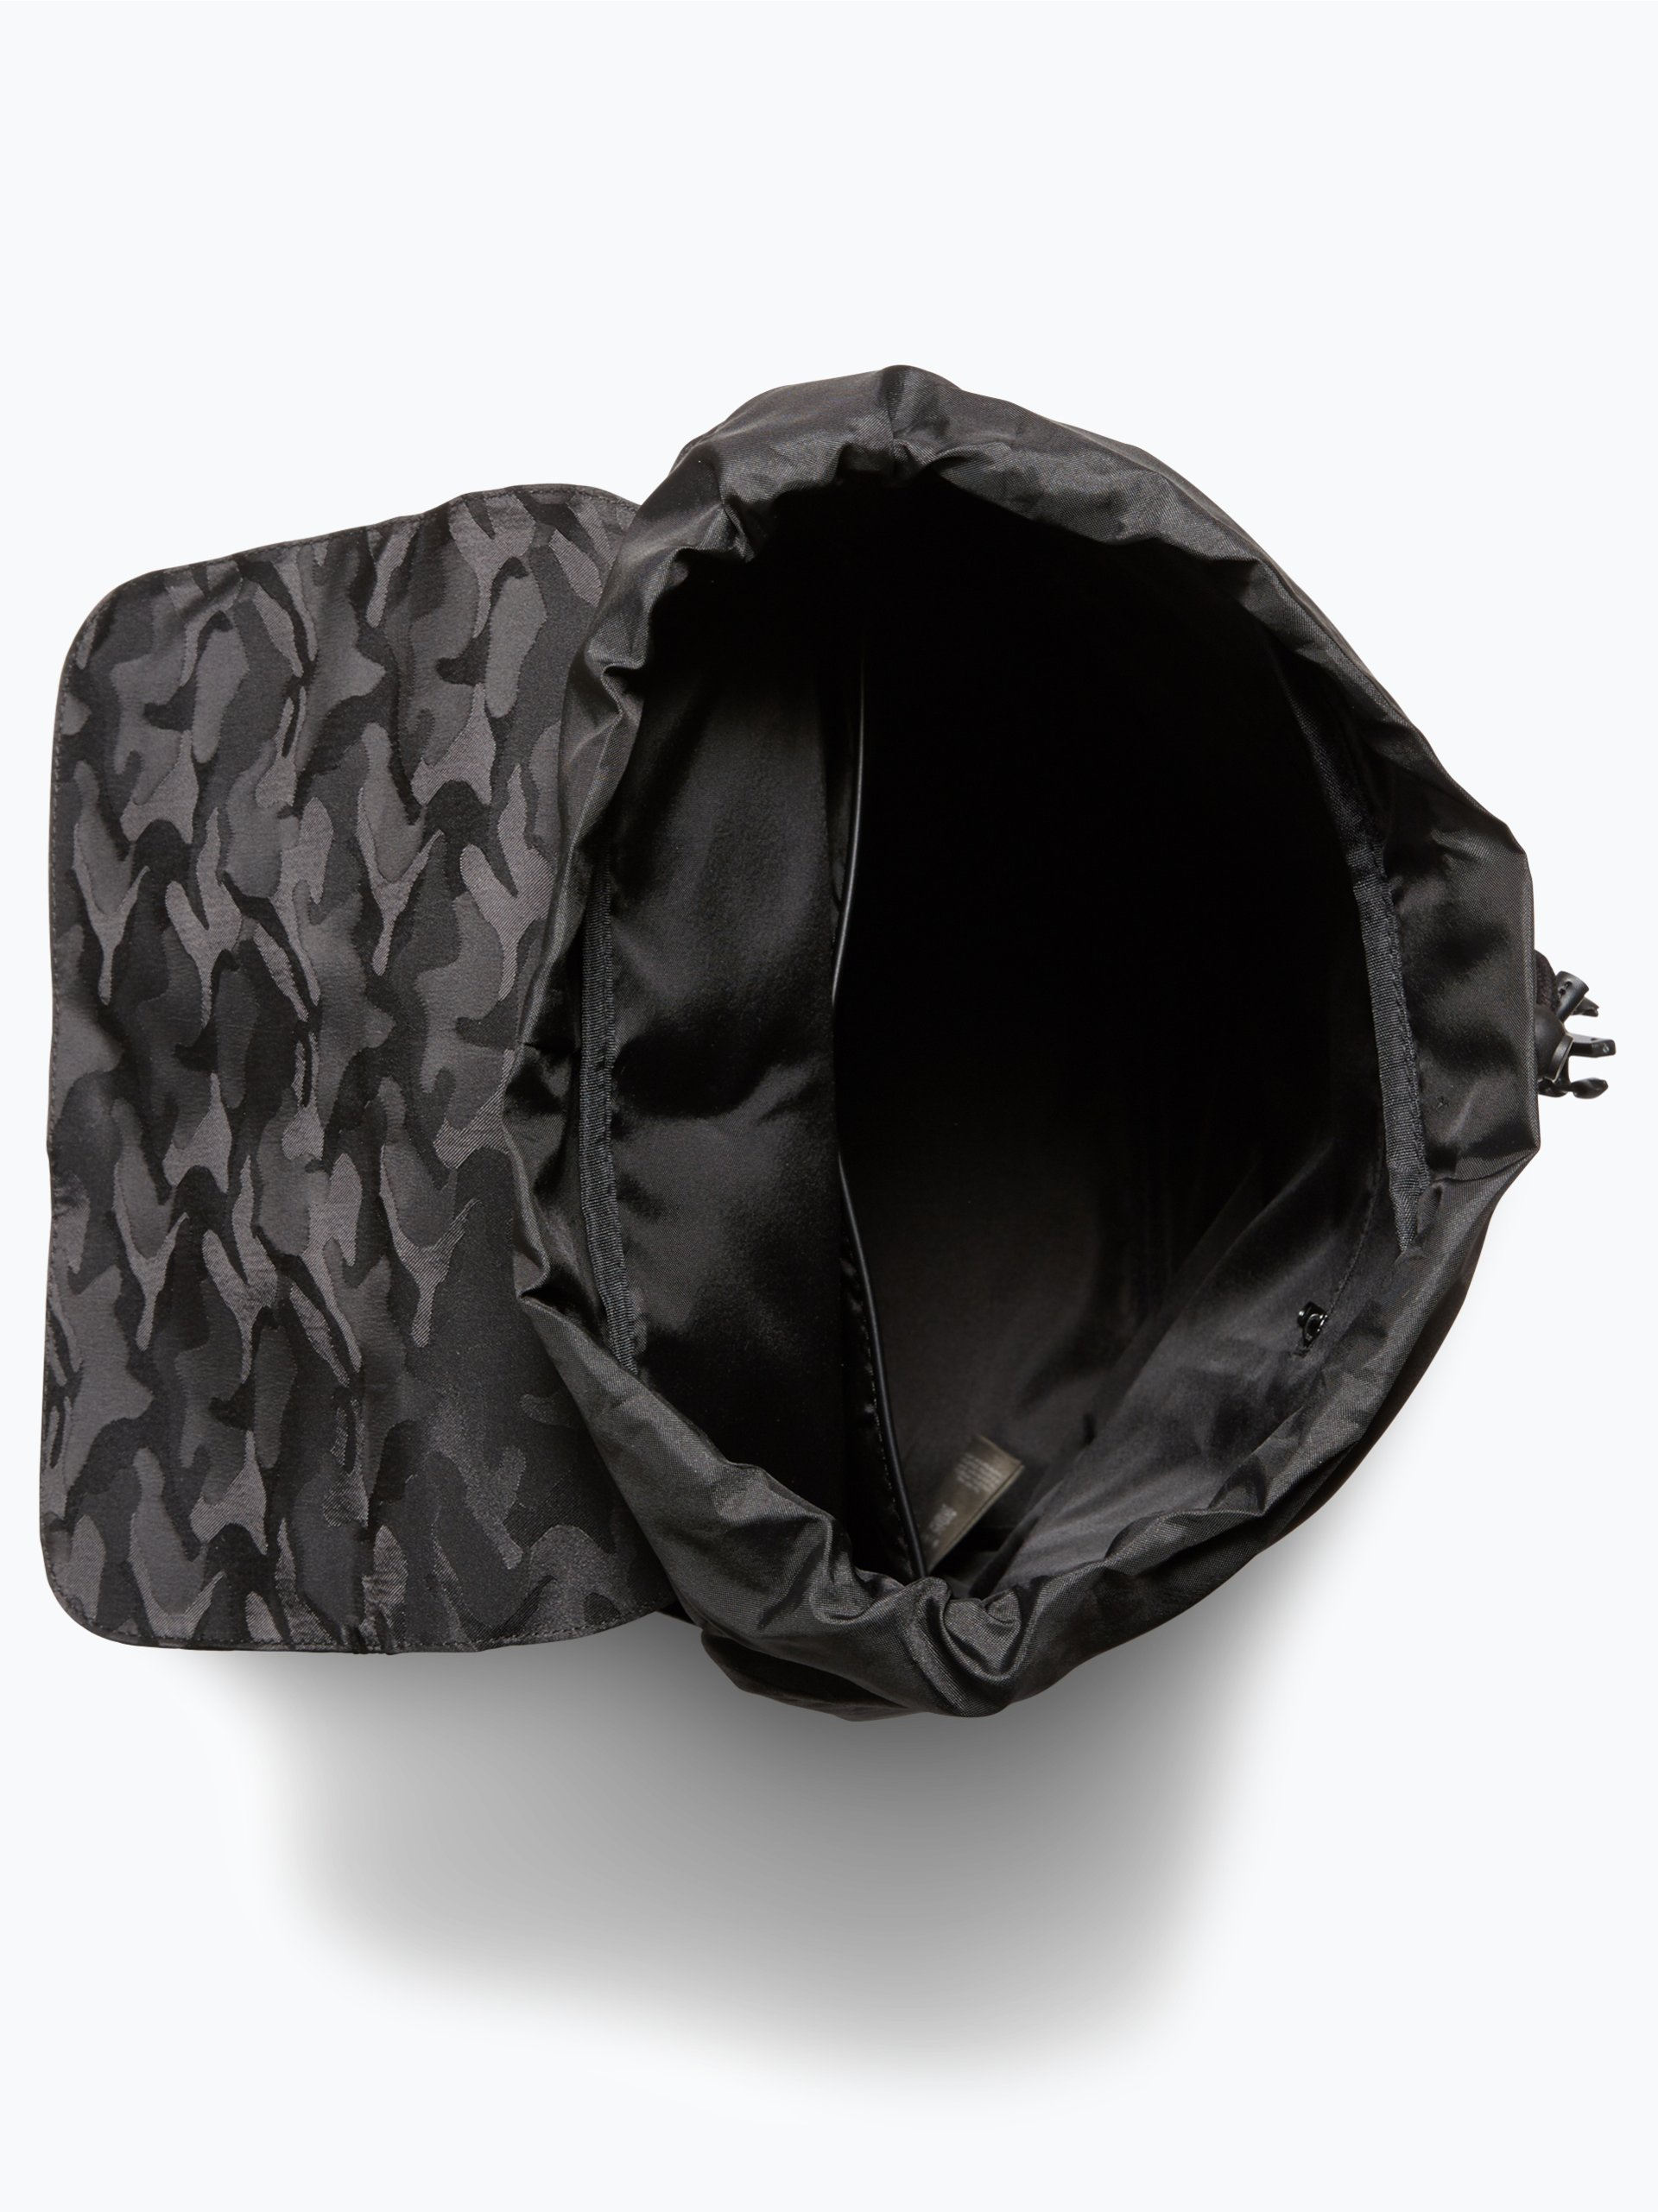 fred perry herren rucksack online kaufen vangraaf com. Black Bedroom Furniture Sets. Home Design Ideas